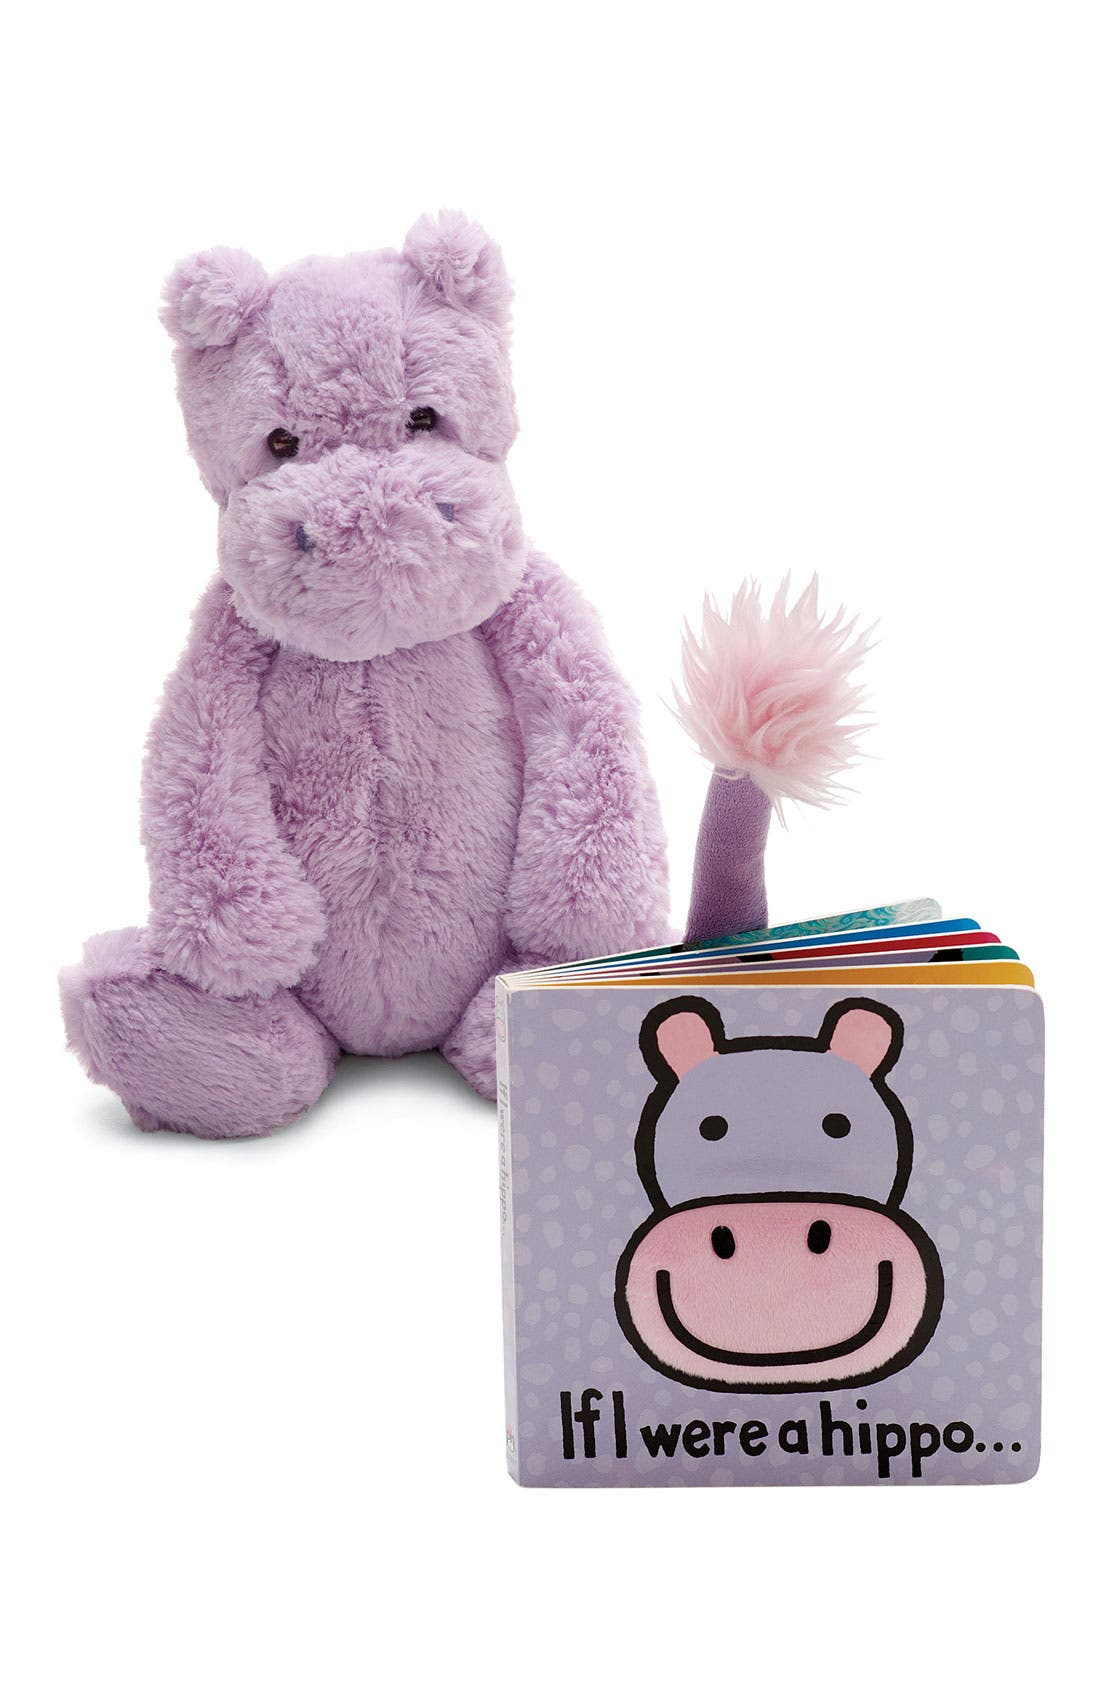 Main Image - Jellycat Board Book & Stuffed Animal